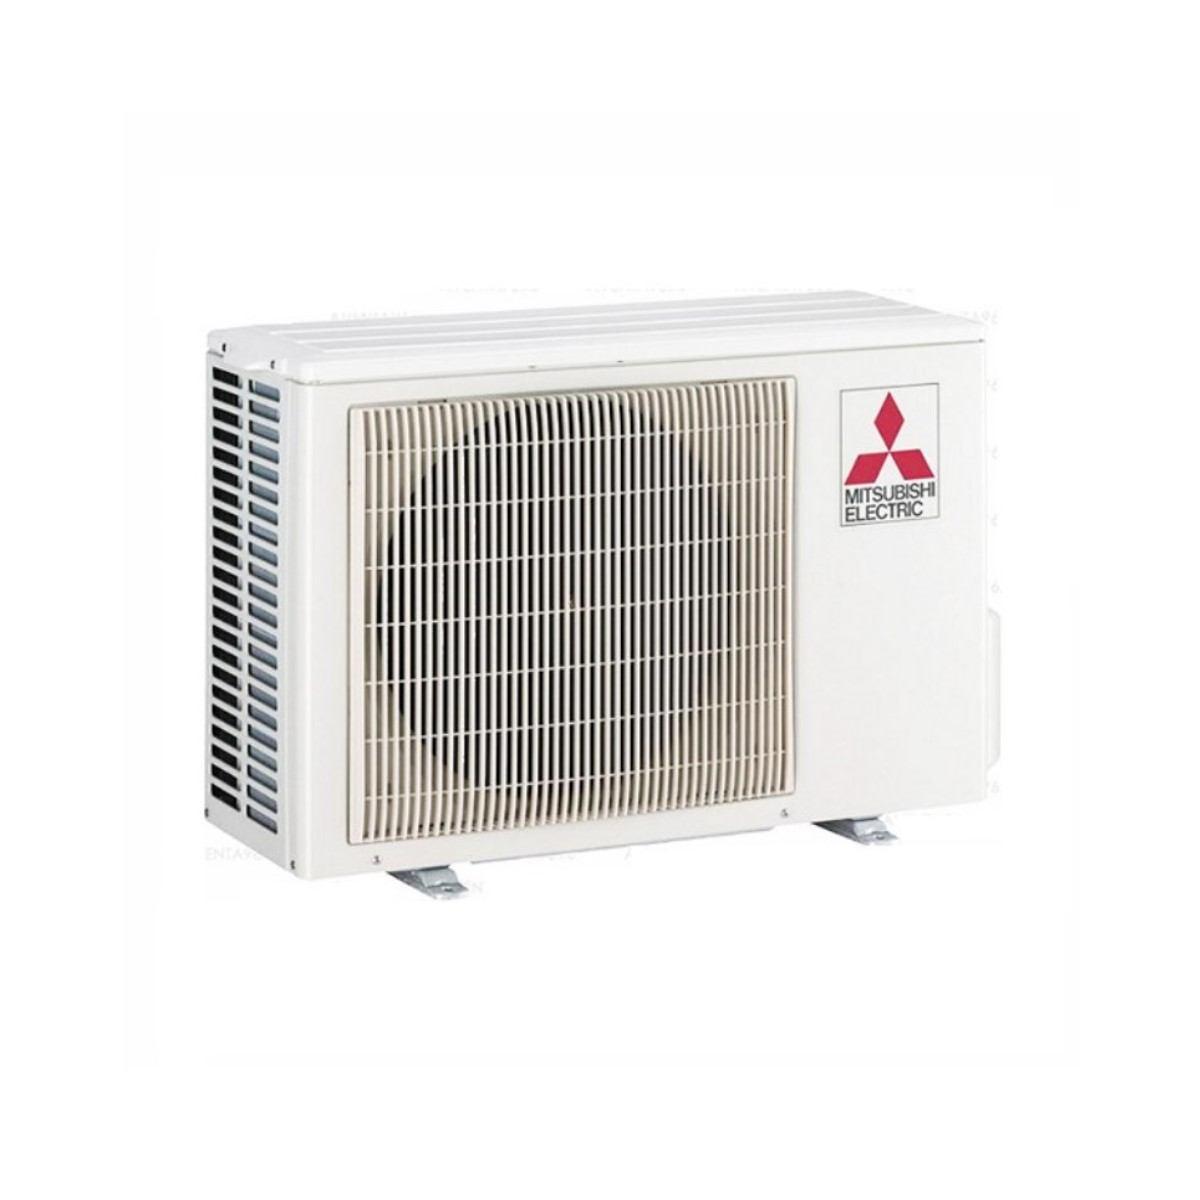 Mitsubishi Electric Klima Uređaj Slz M35fa Suz Ka35va5